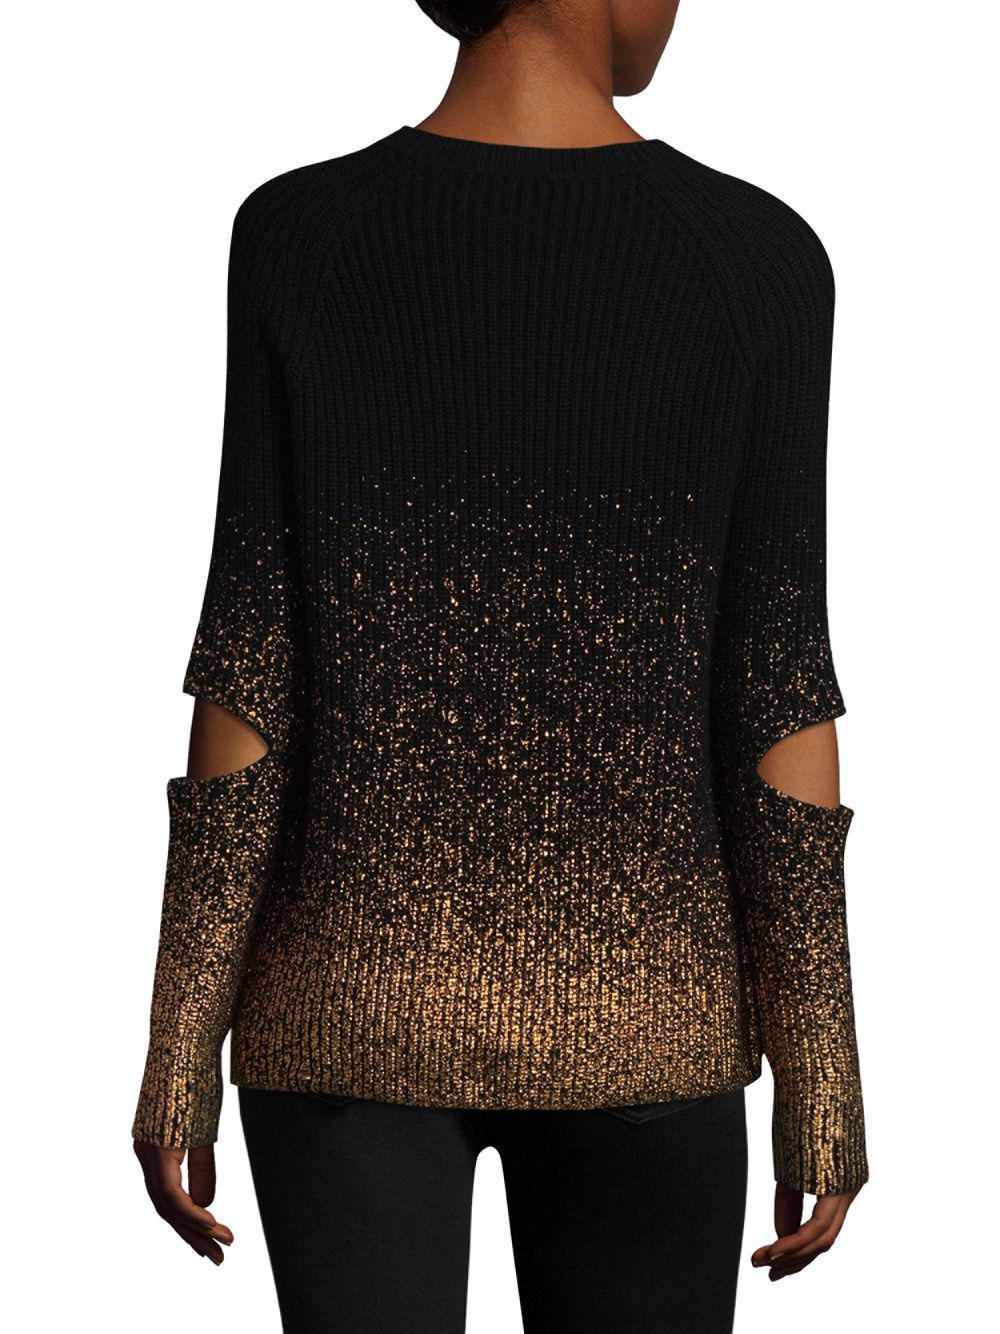 9781241827e6 Zoe Jordan Ribbed Metallic Cut-out Sweater in Black - Save 27% - Lyst